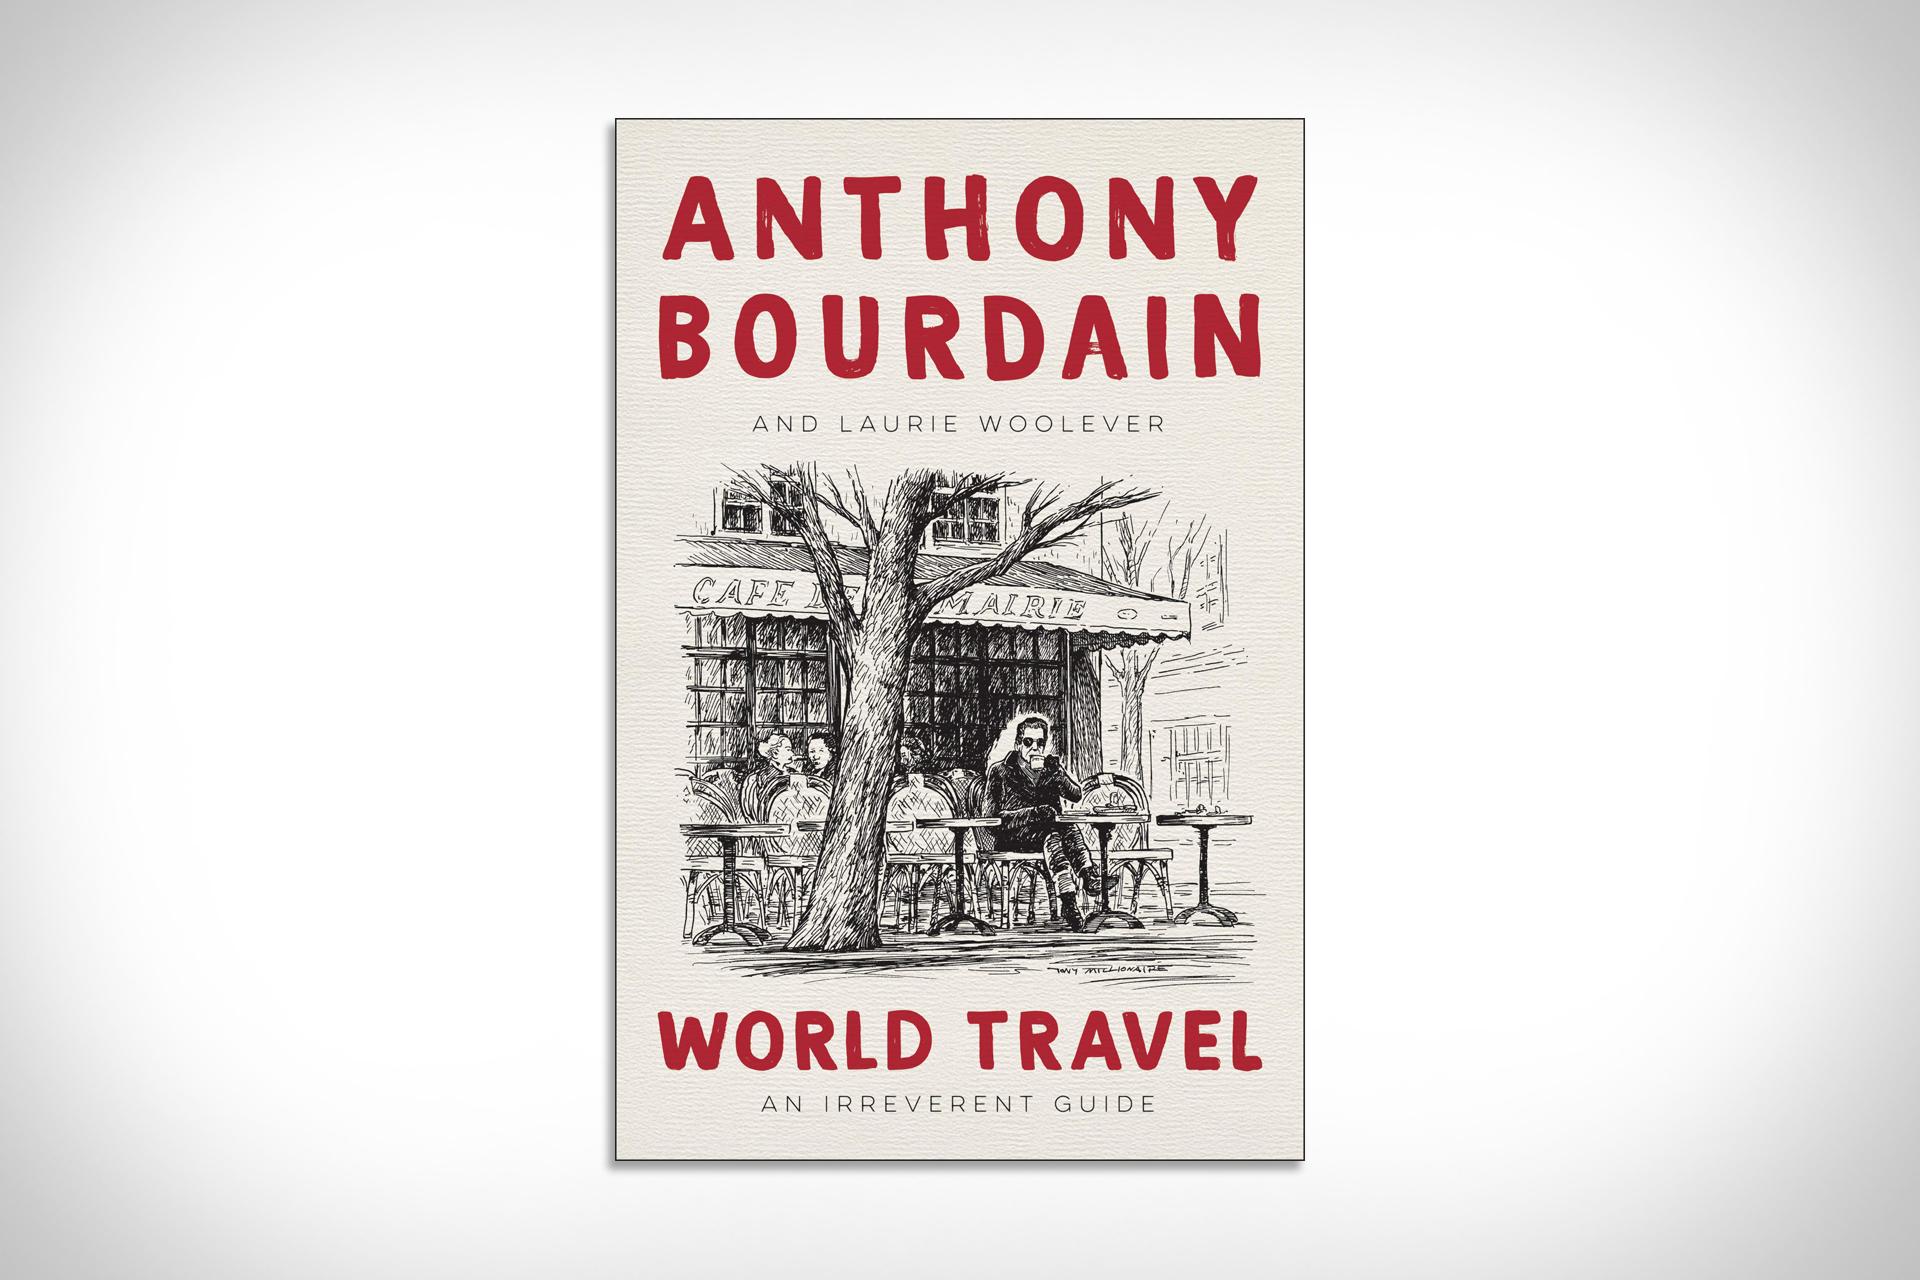 Anthony Bourdain's World Travel: An Irreverent Guide